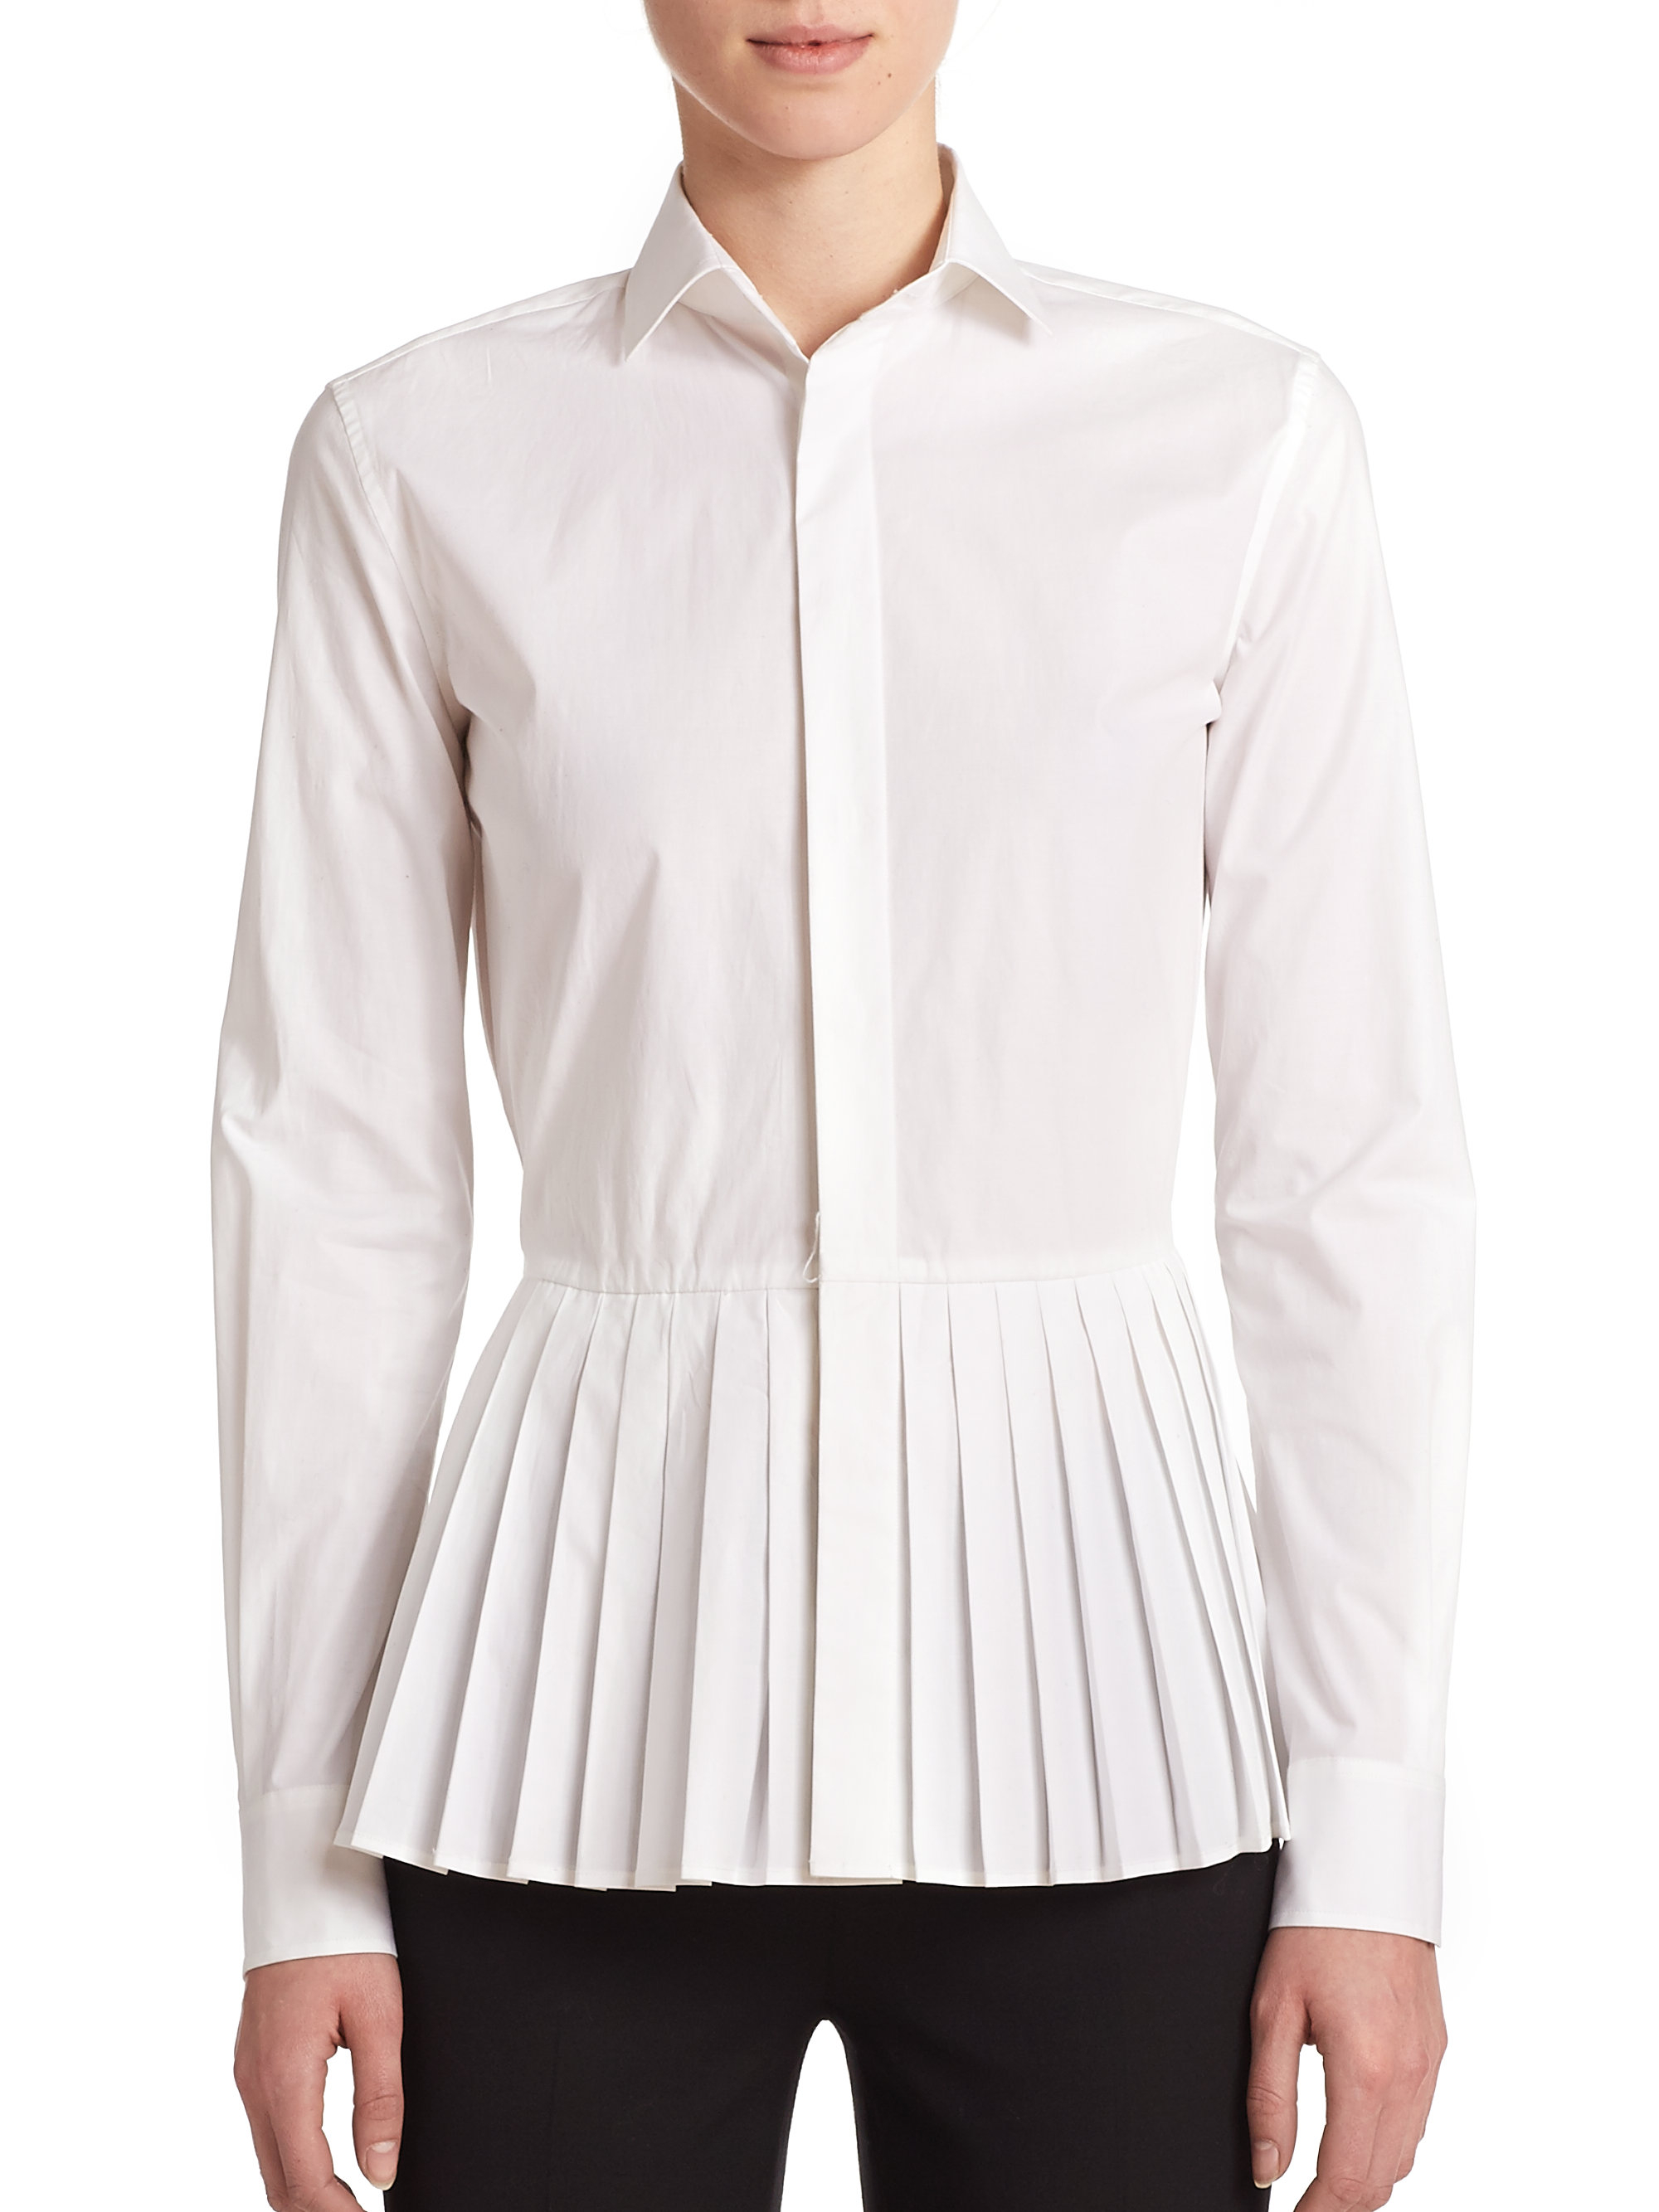 ralph lauren white cotton blouse silk pintuck blouse. Black Bedroom Furniture Sets. Home Design Ideas